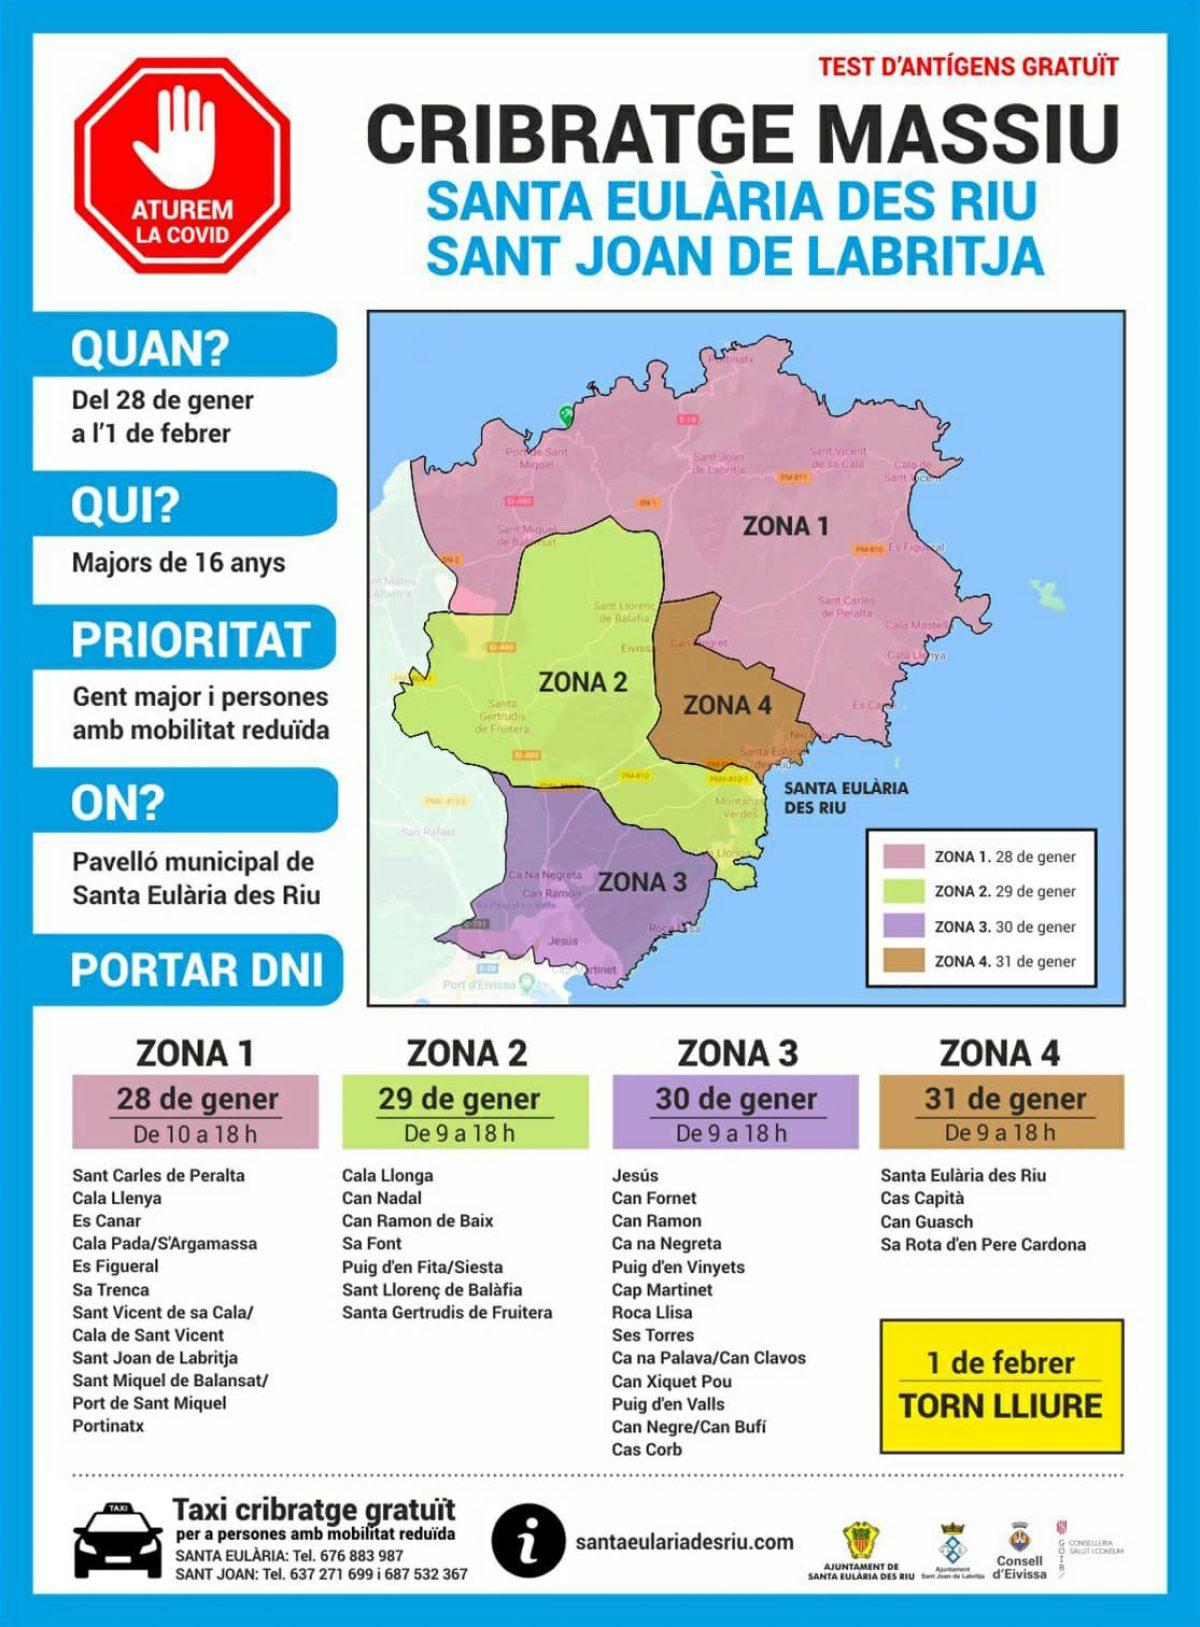 cribratge-massiu-covid-19-santa-eulalia-Eivissa-gener-2021-welcometoibiza